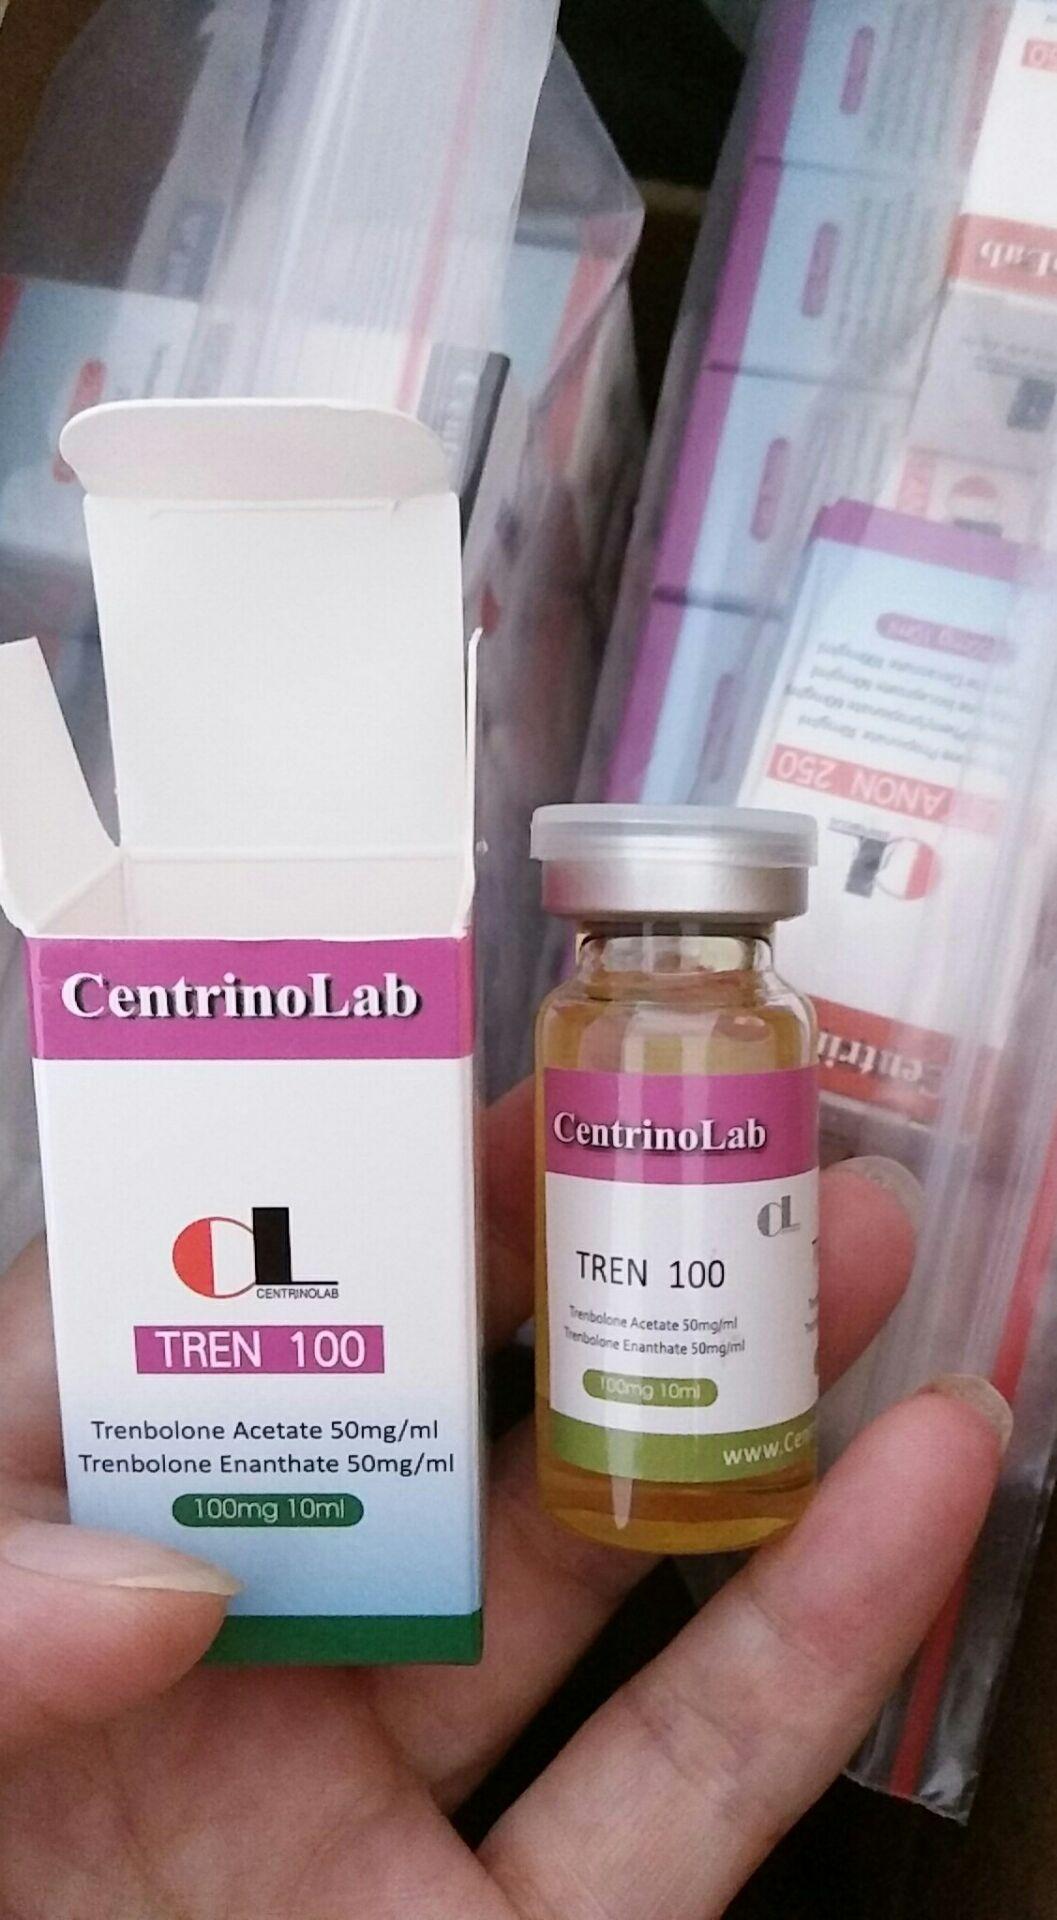 Tren 100/Tren a +tren E Anabolic Steroids test acetate Muscle Gain